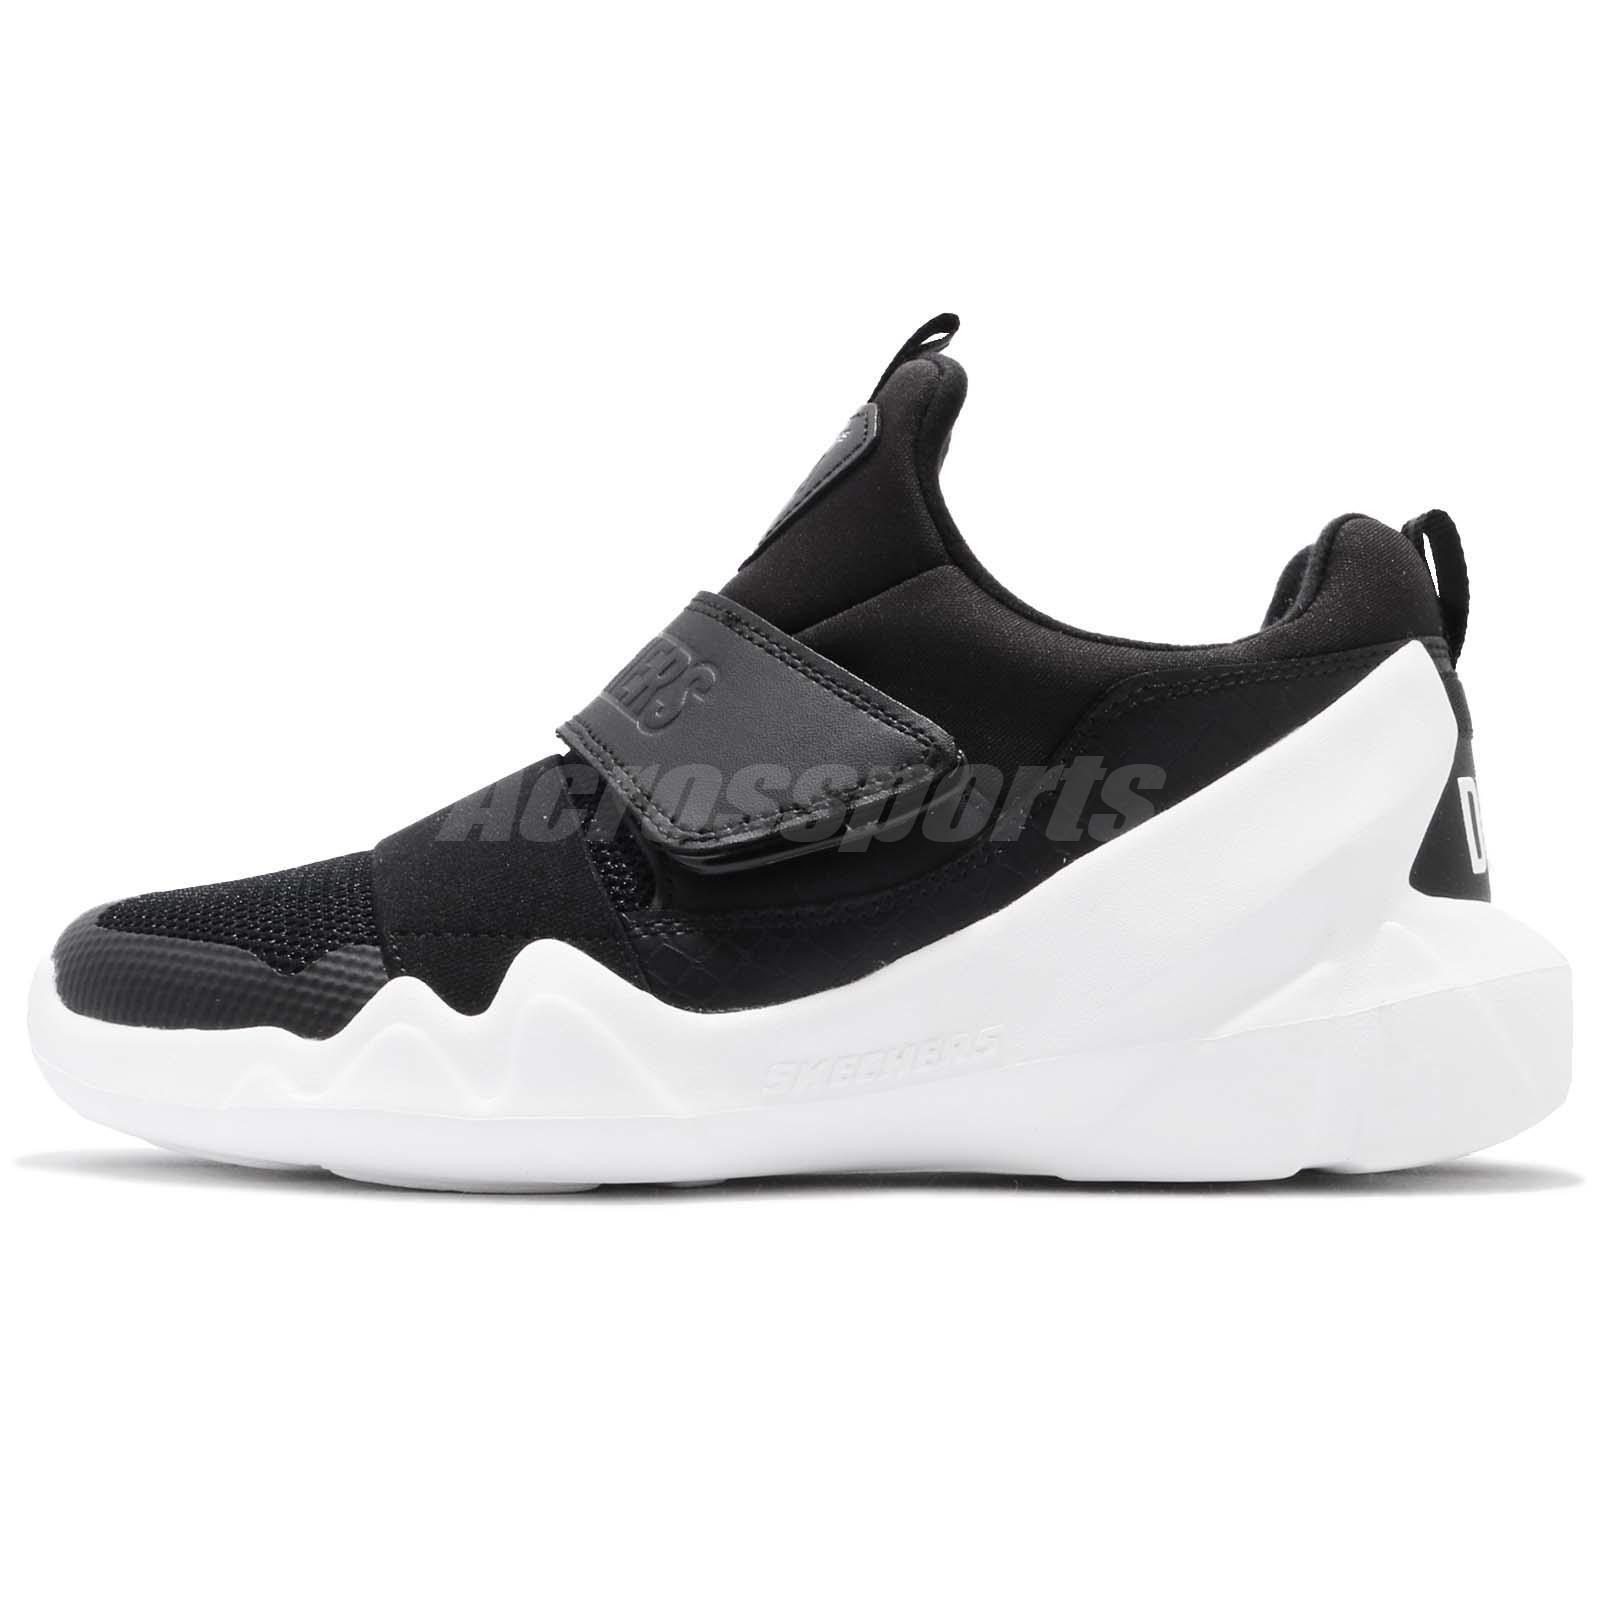 Skechers D Lites DLT-A Black White Women Running Shoes Sneakers 66666085-BLK